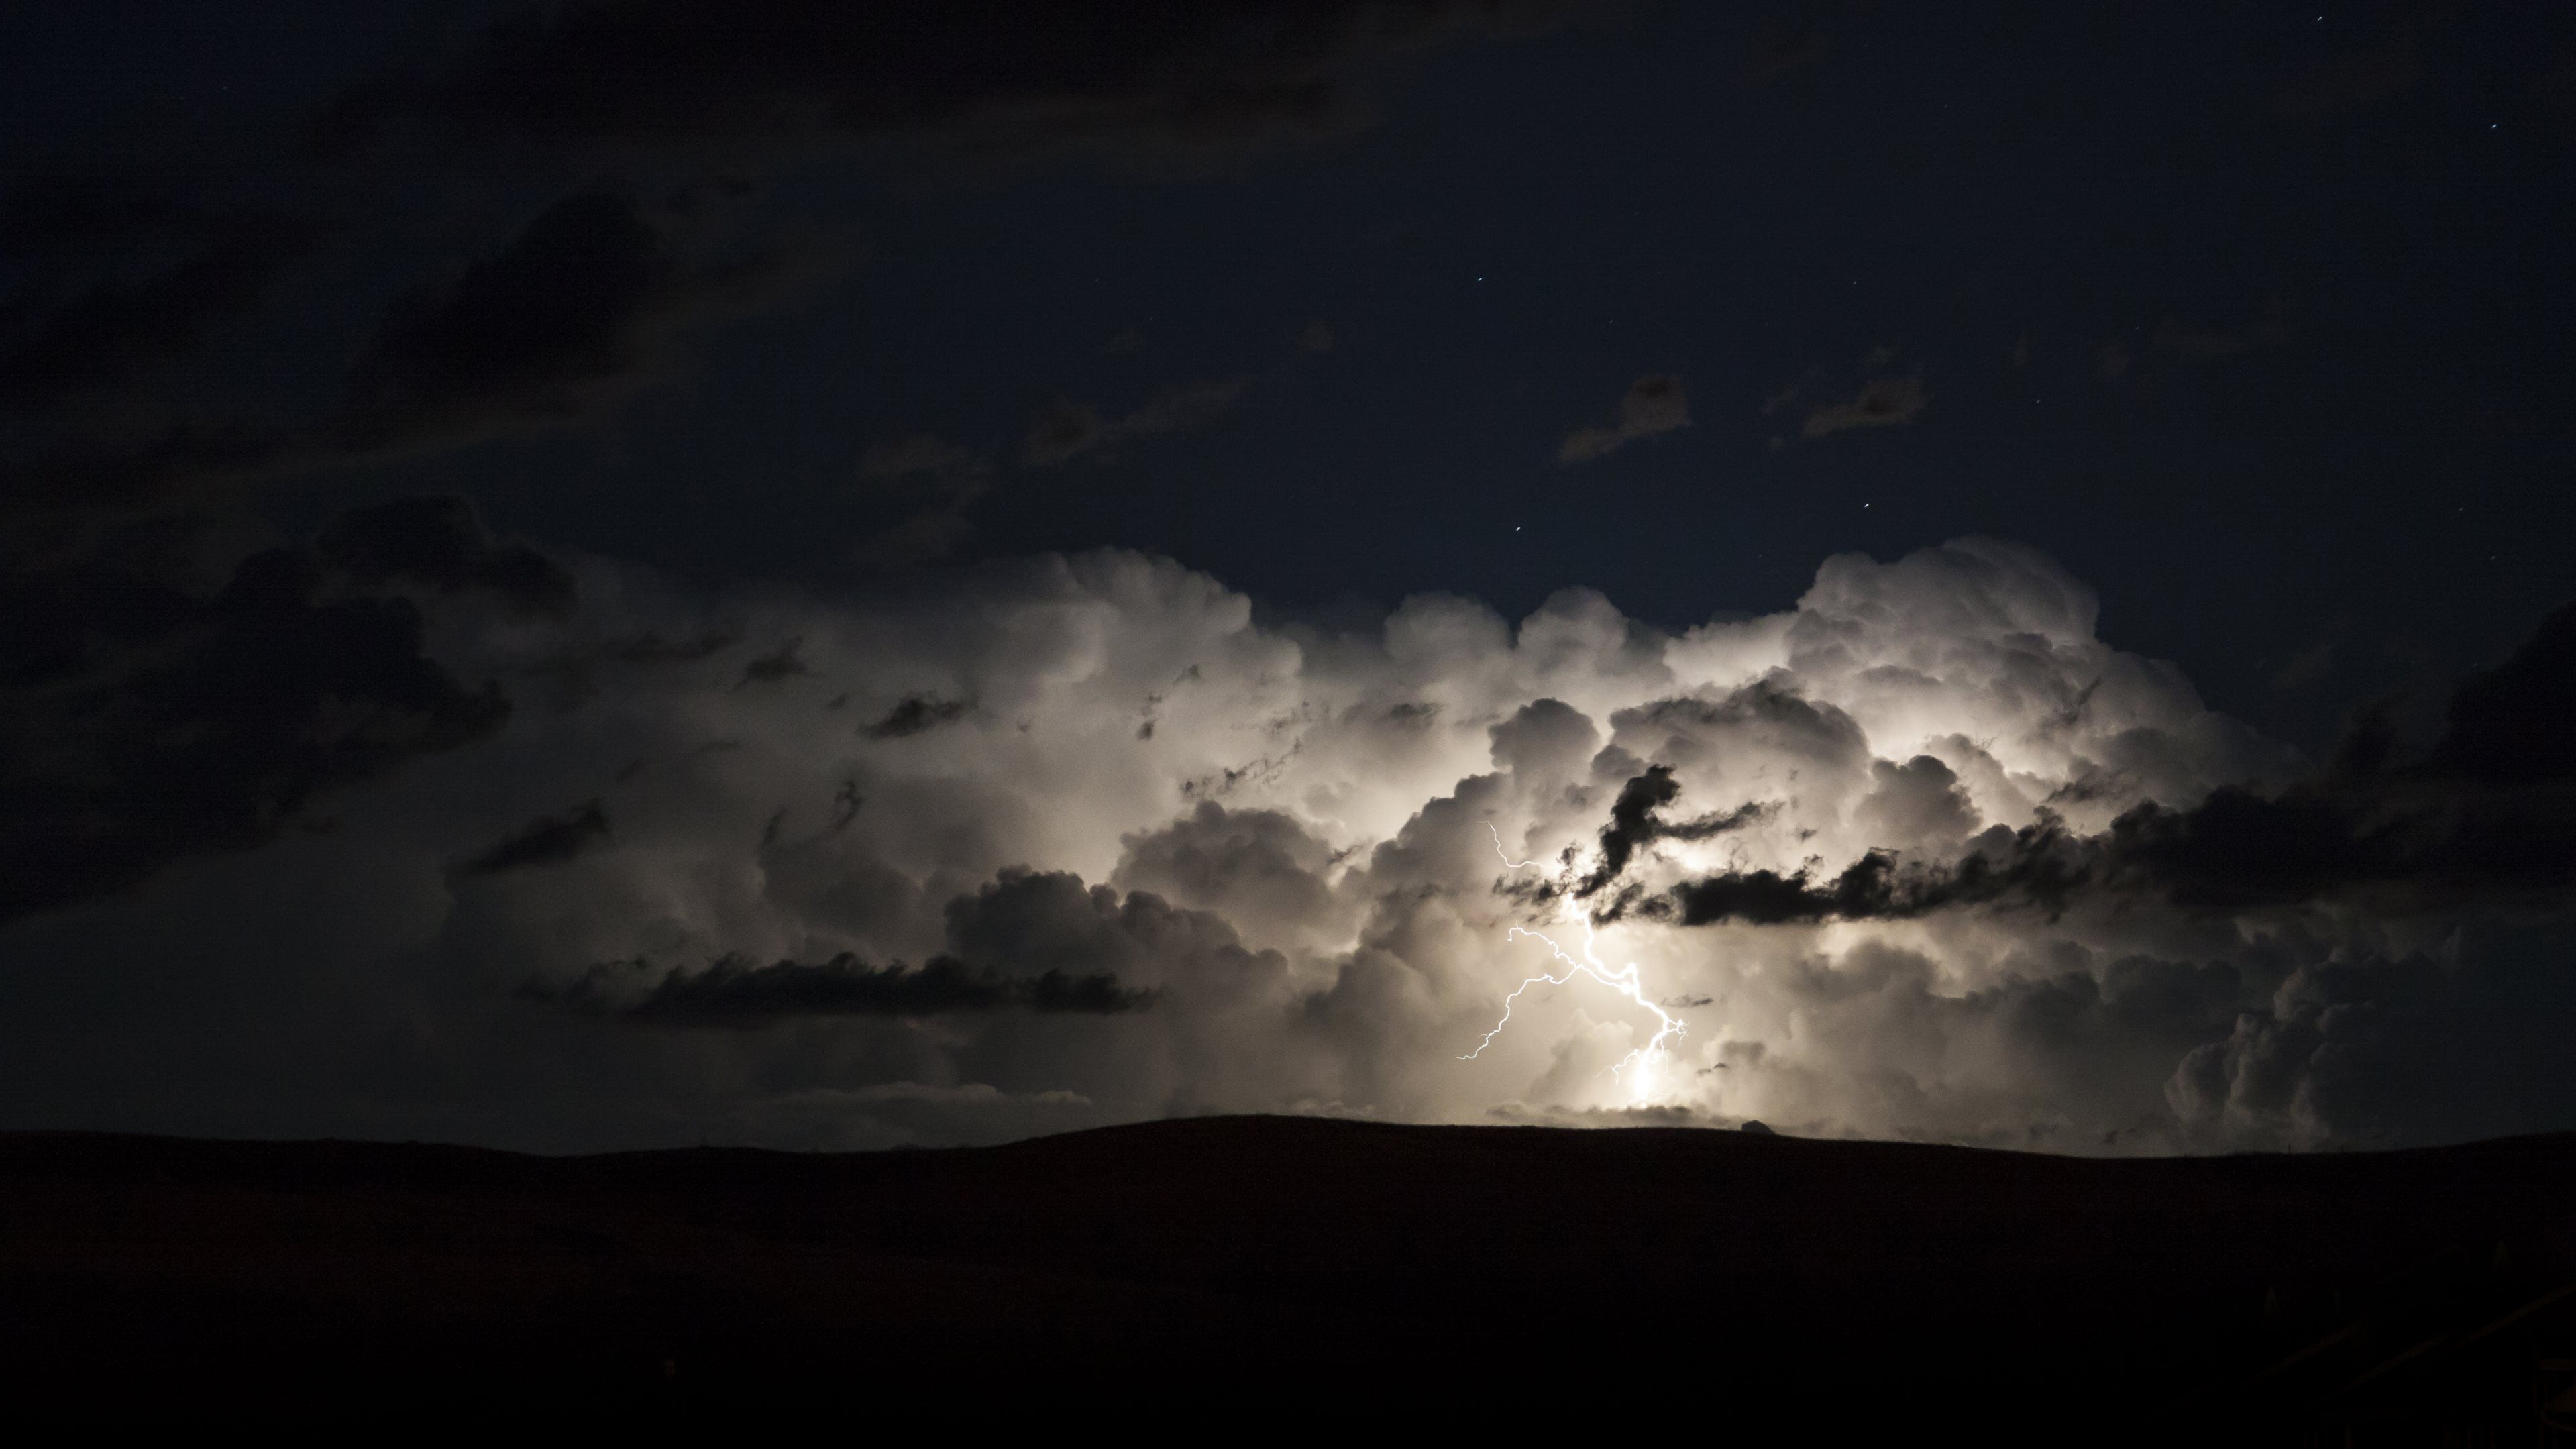 Thunderstorm Wallpapers · 4K HD Desktop Backgrounds Phone